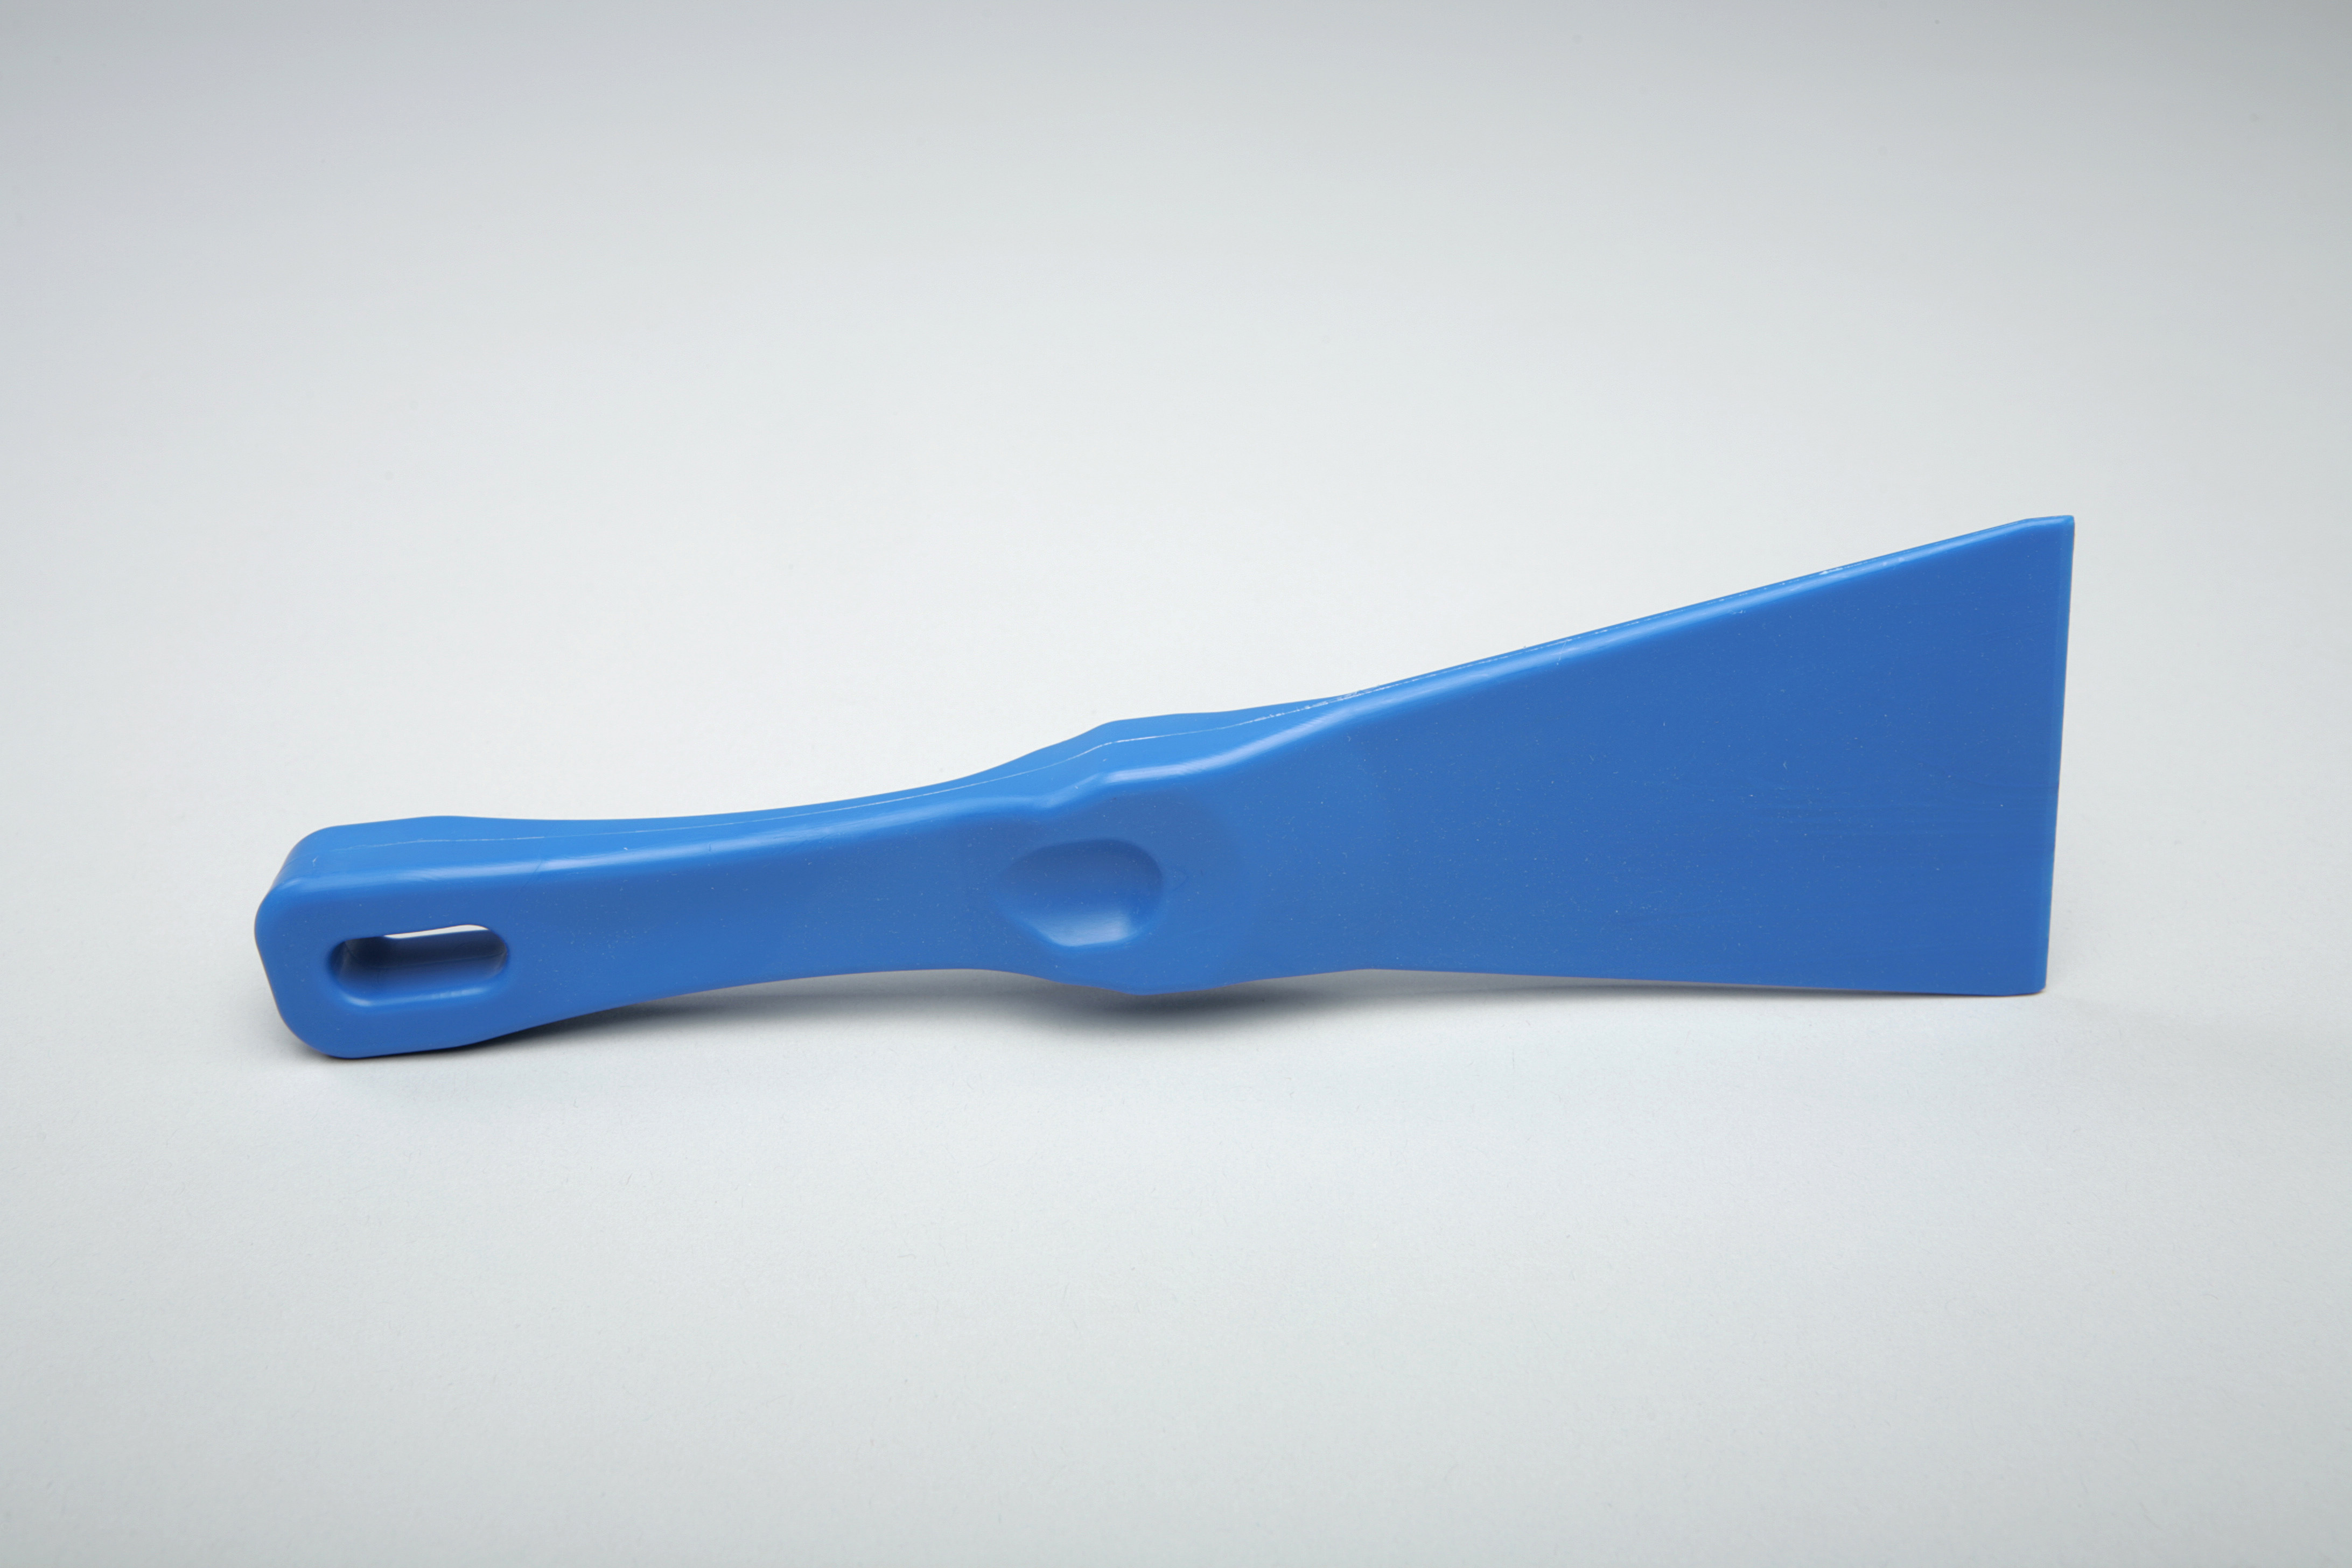 Unimop spaatel varrega 75 x 250 mm, kollane, kastis 12 tk